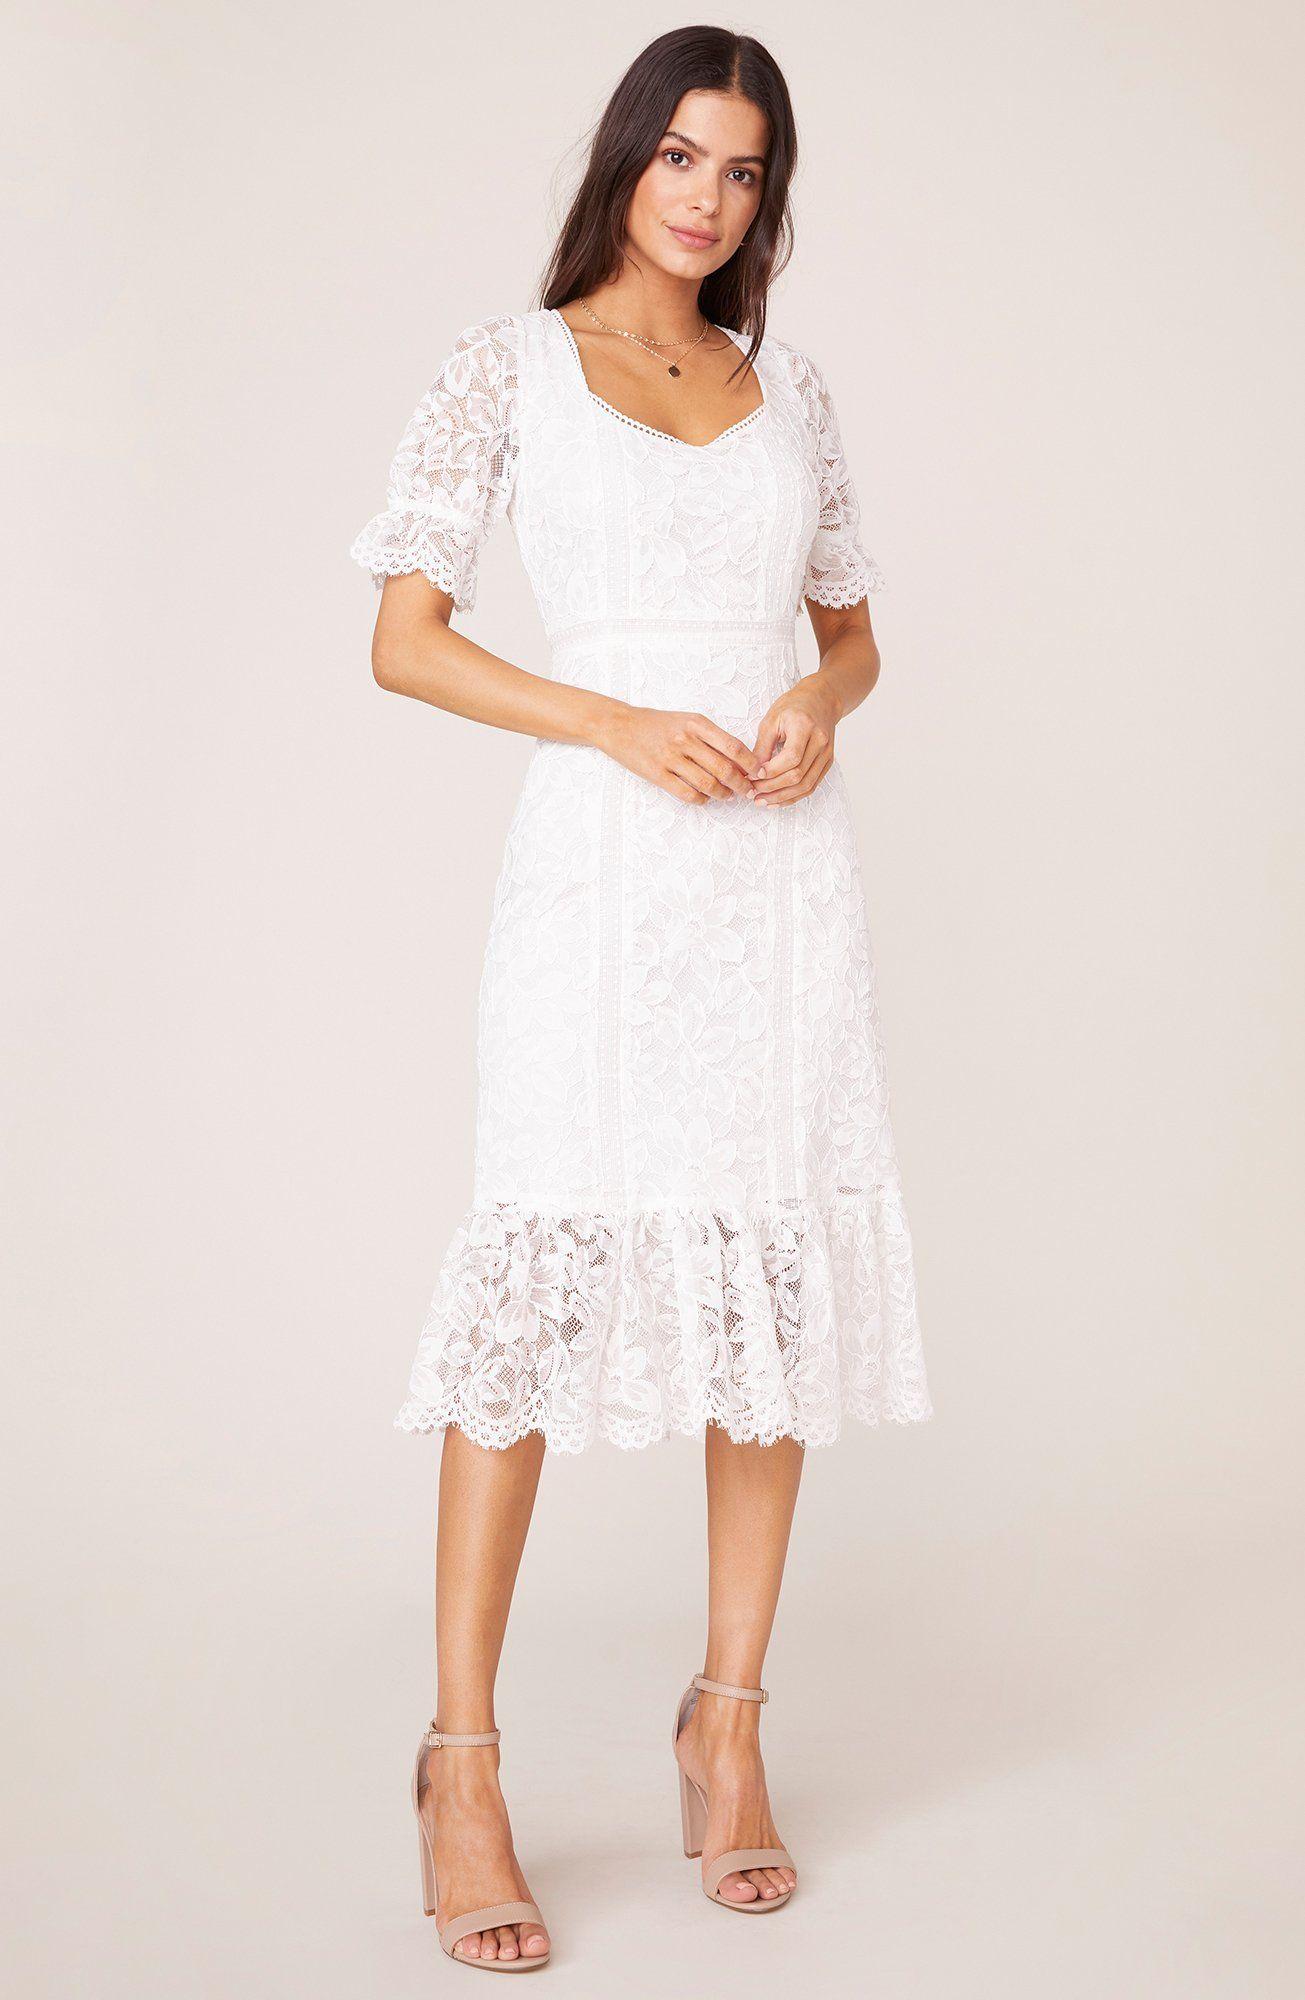 Just In Lace Midi Dress Bb Dakota Modest White Dress Lace White Dress Dresses [ 2000 x 1305 Pixel ]